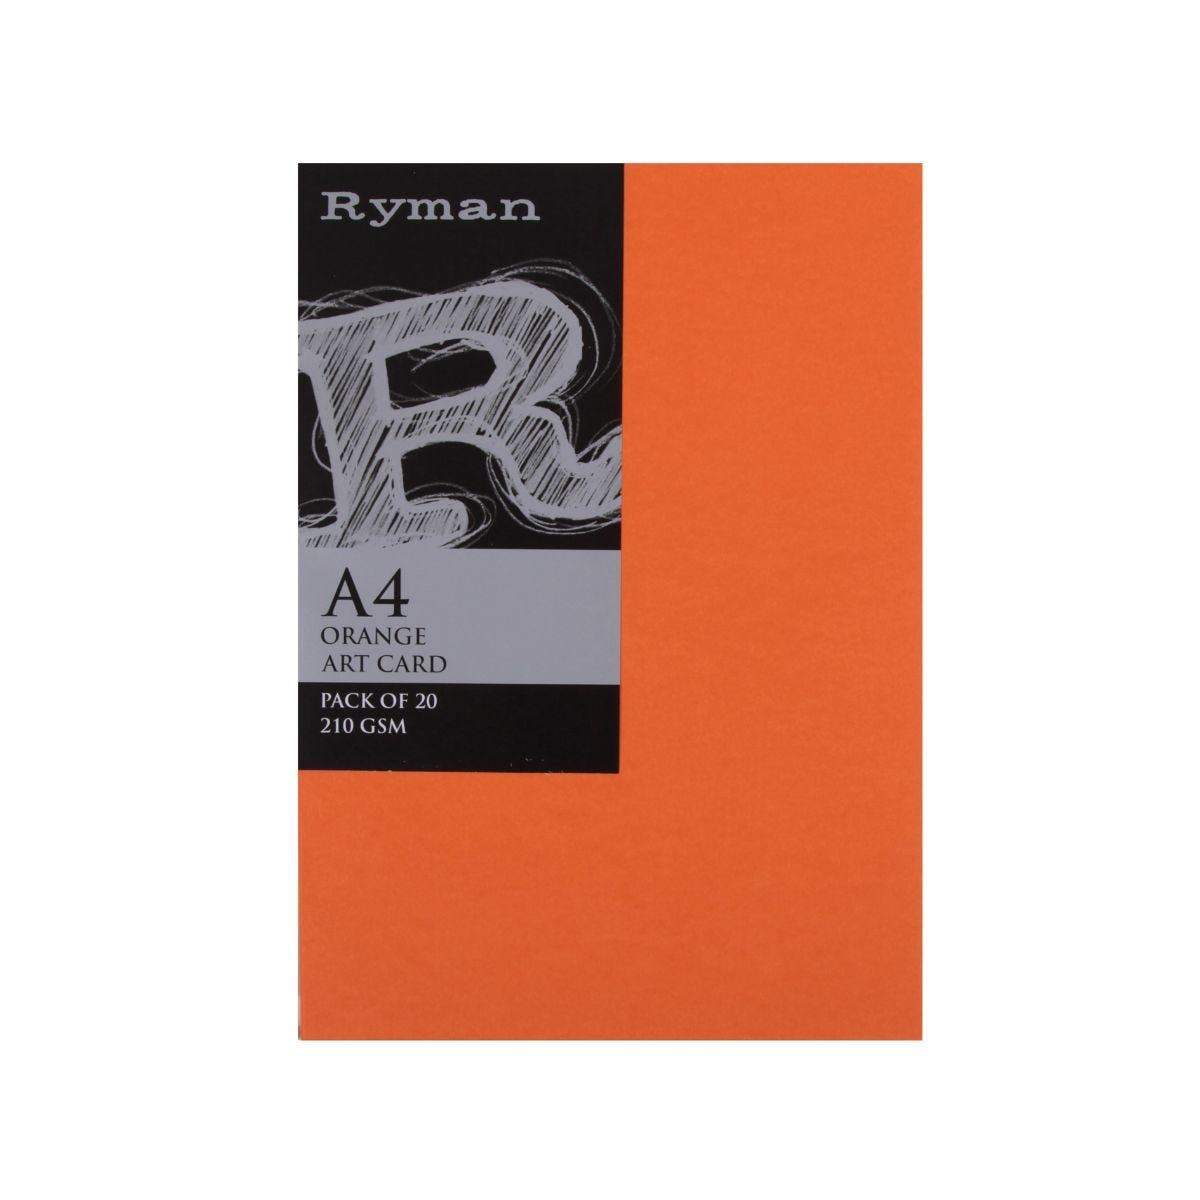 Ryman Artcard A4 210gsm Pack of 20, Orange